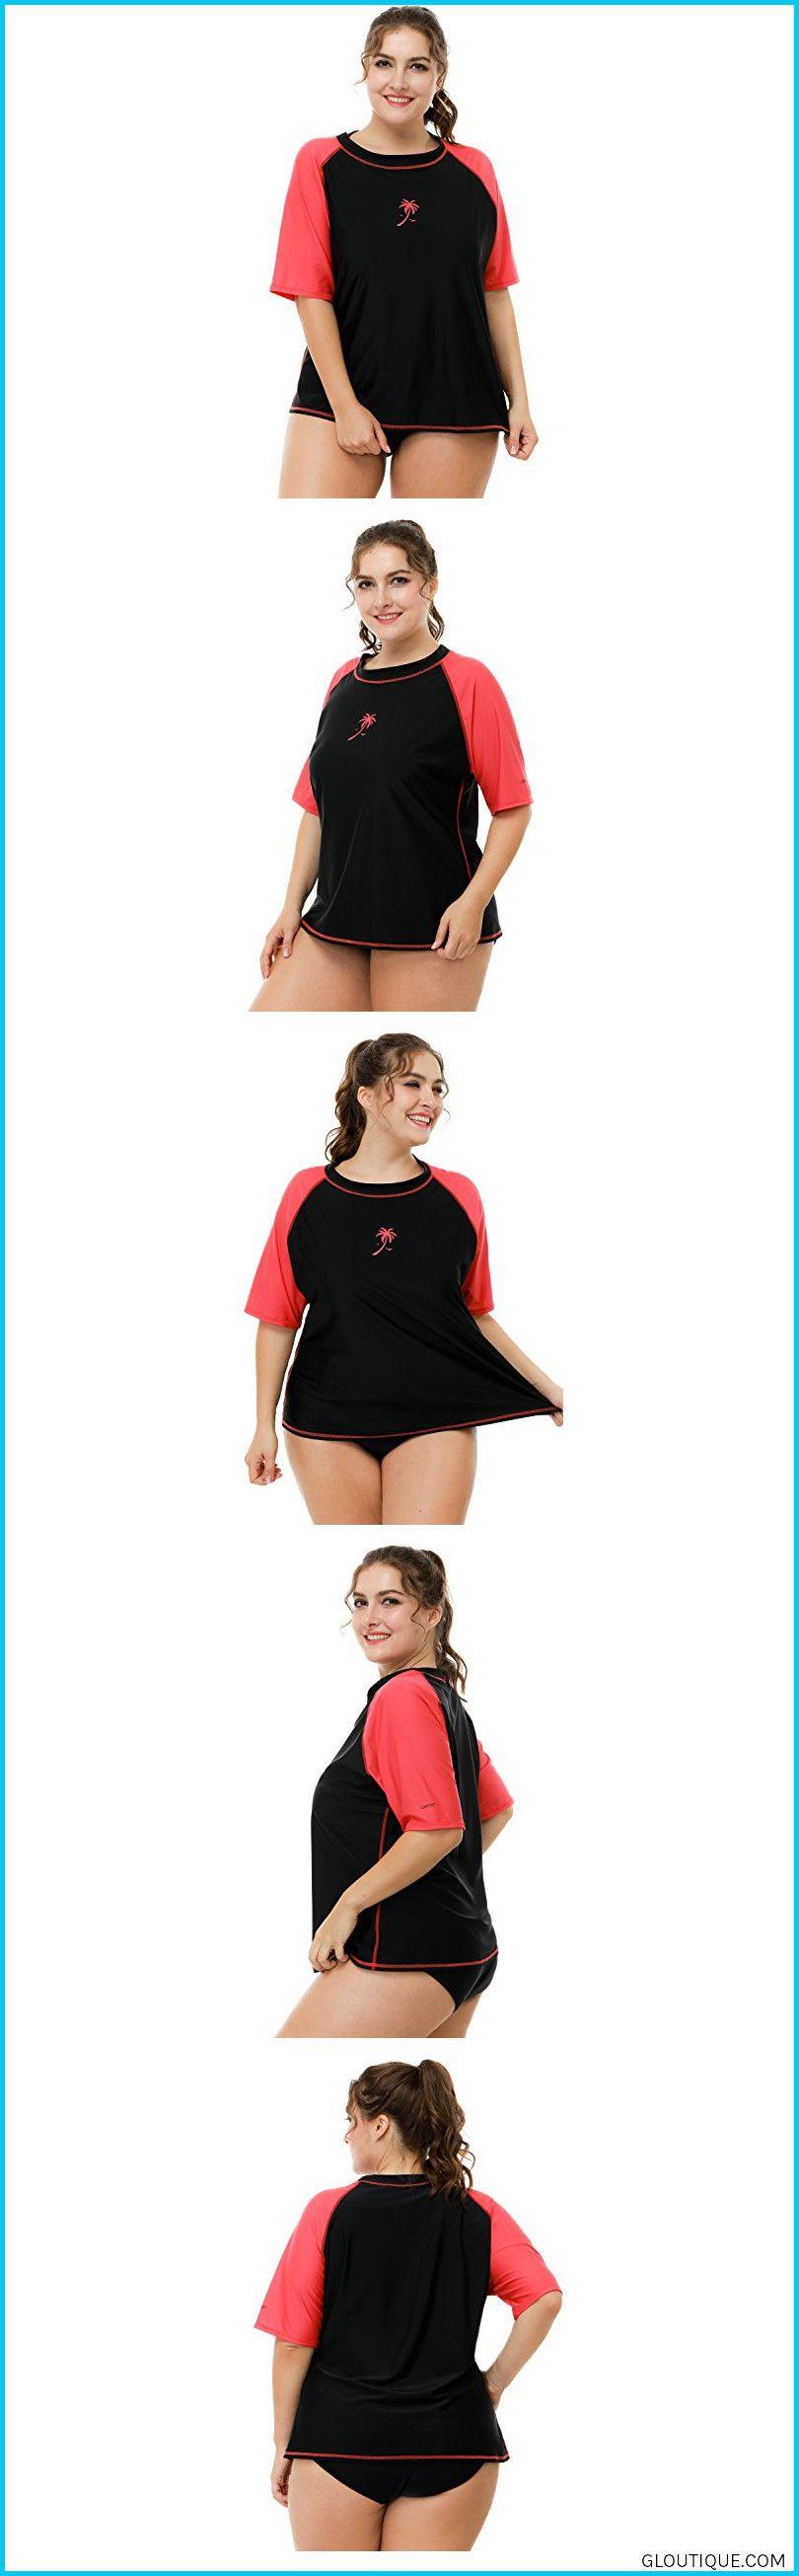 ddd1233a88 Color block and floral rashguard swimuit features short-sleeve and crew  ne#shopSociala Womens Plus Size Swim Shirt Sun Protection Rashguard  Swimsuit 1X ...